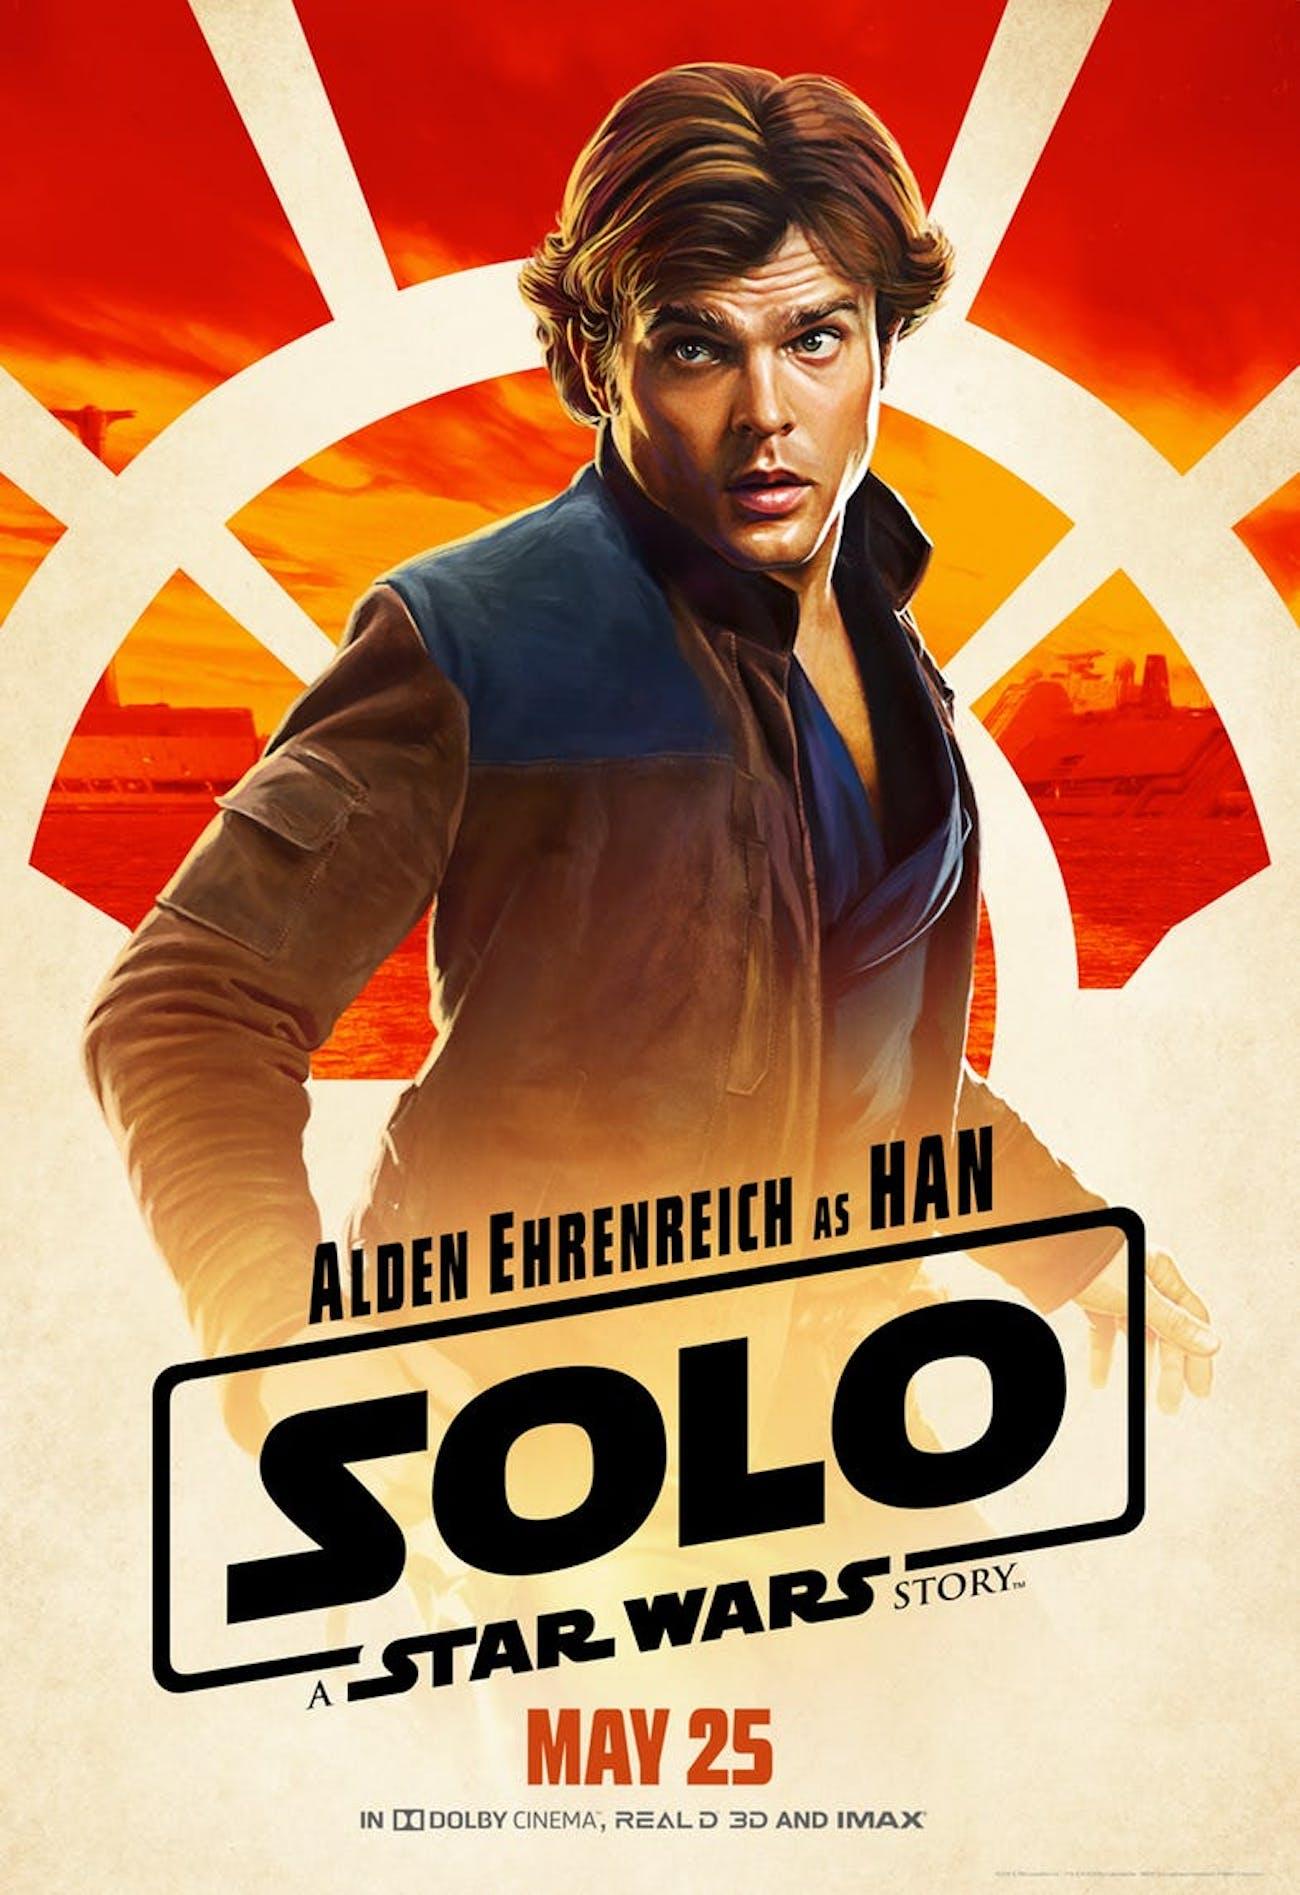 Alden Ehrenreich as Han Solo in 'Solo: A Star Wars Story.'